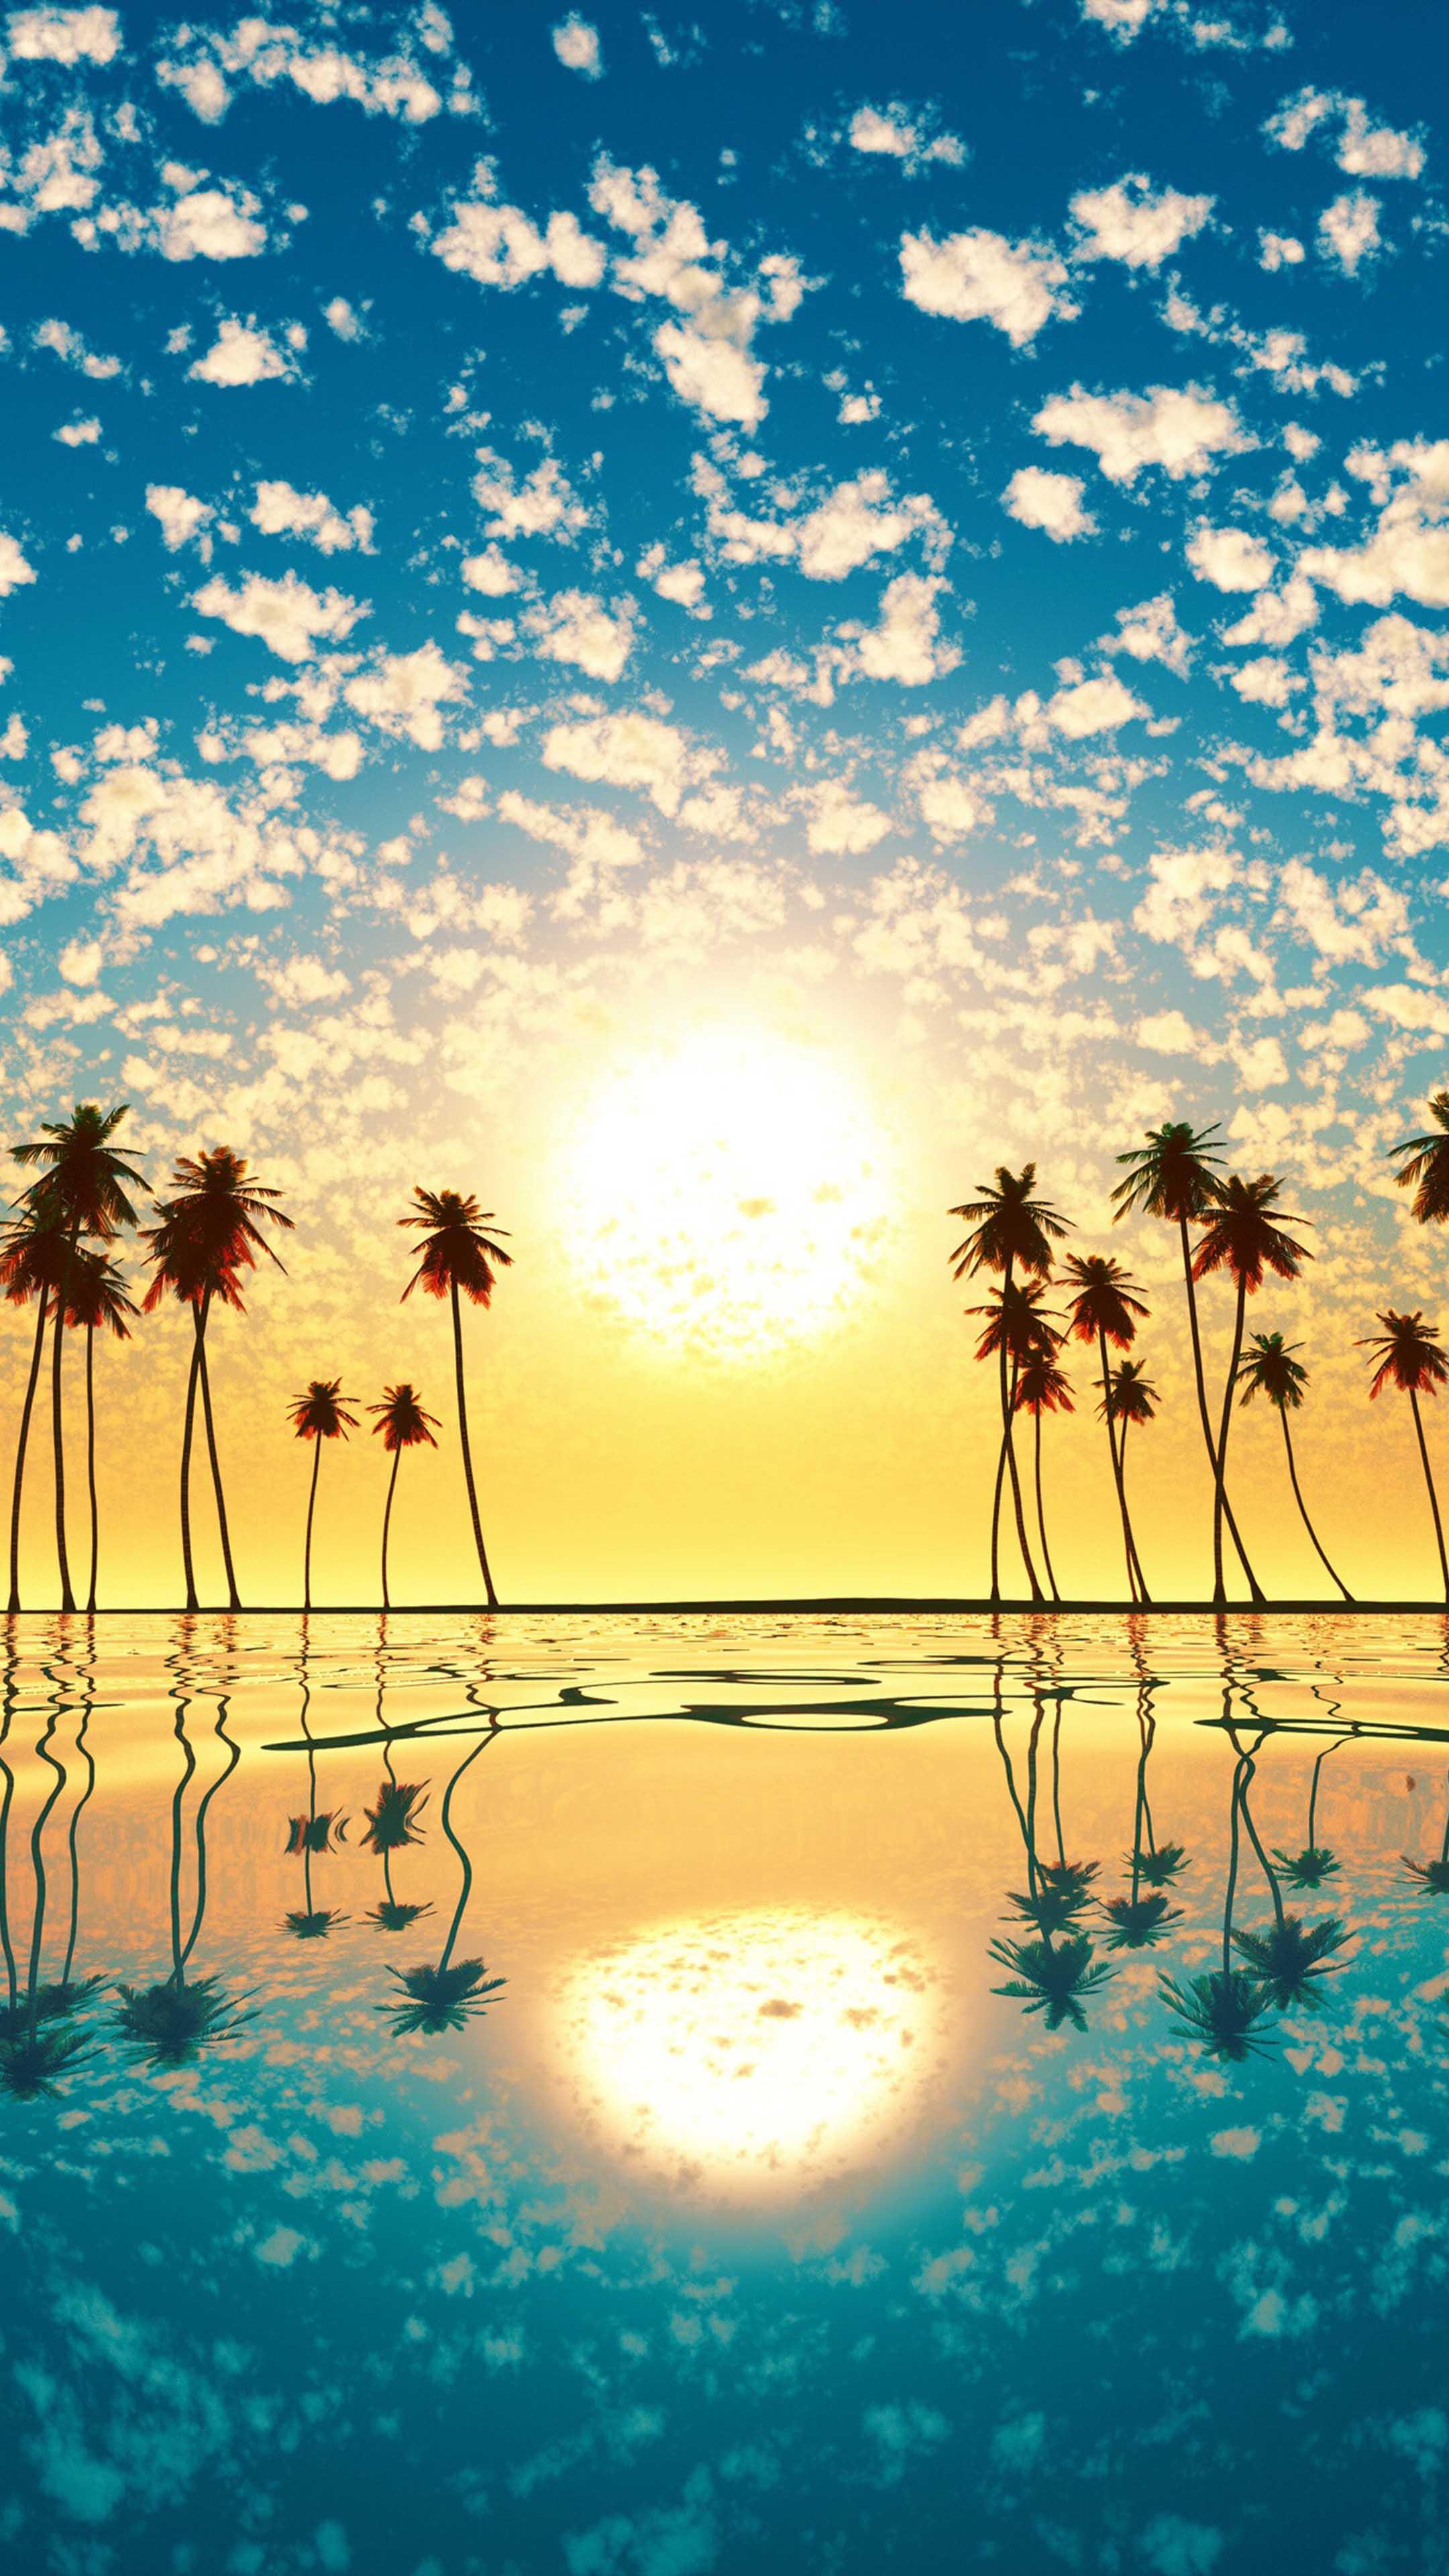 Sunset Palm Tree Cloud Sky Reflection Free 4K Ultra HD ...